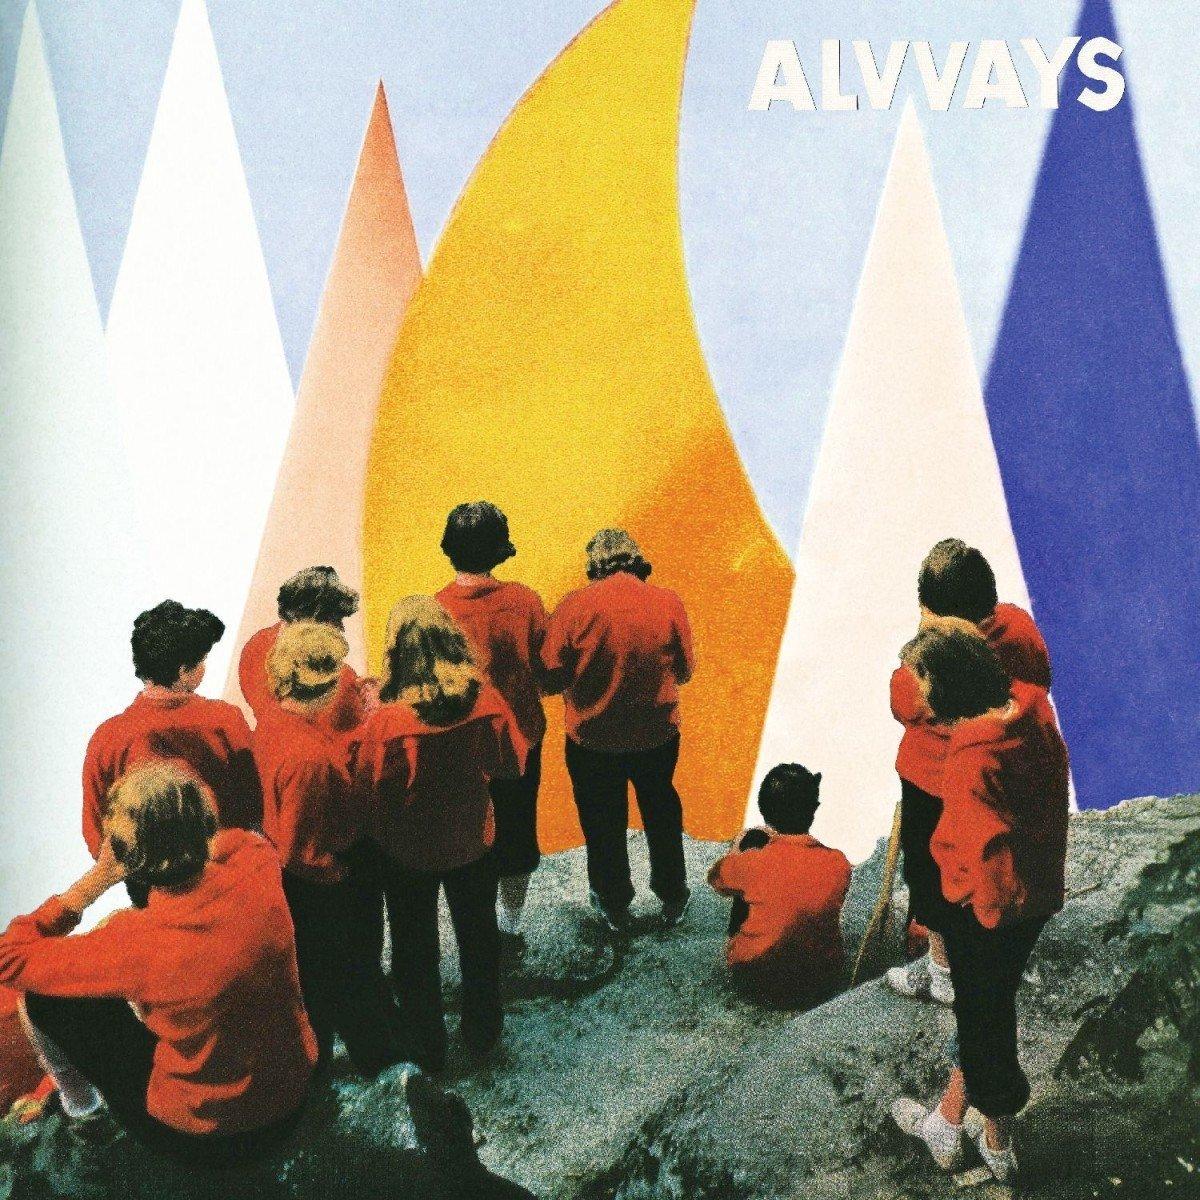 Alvvays – Antisocialites (Transgressive)